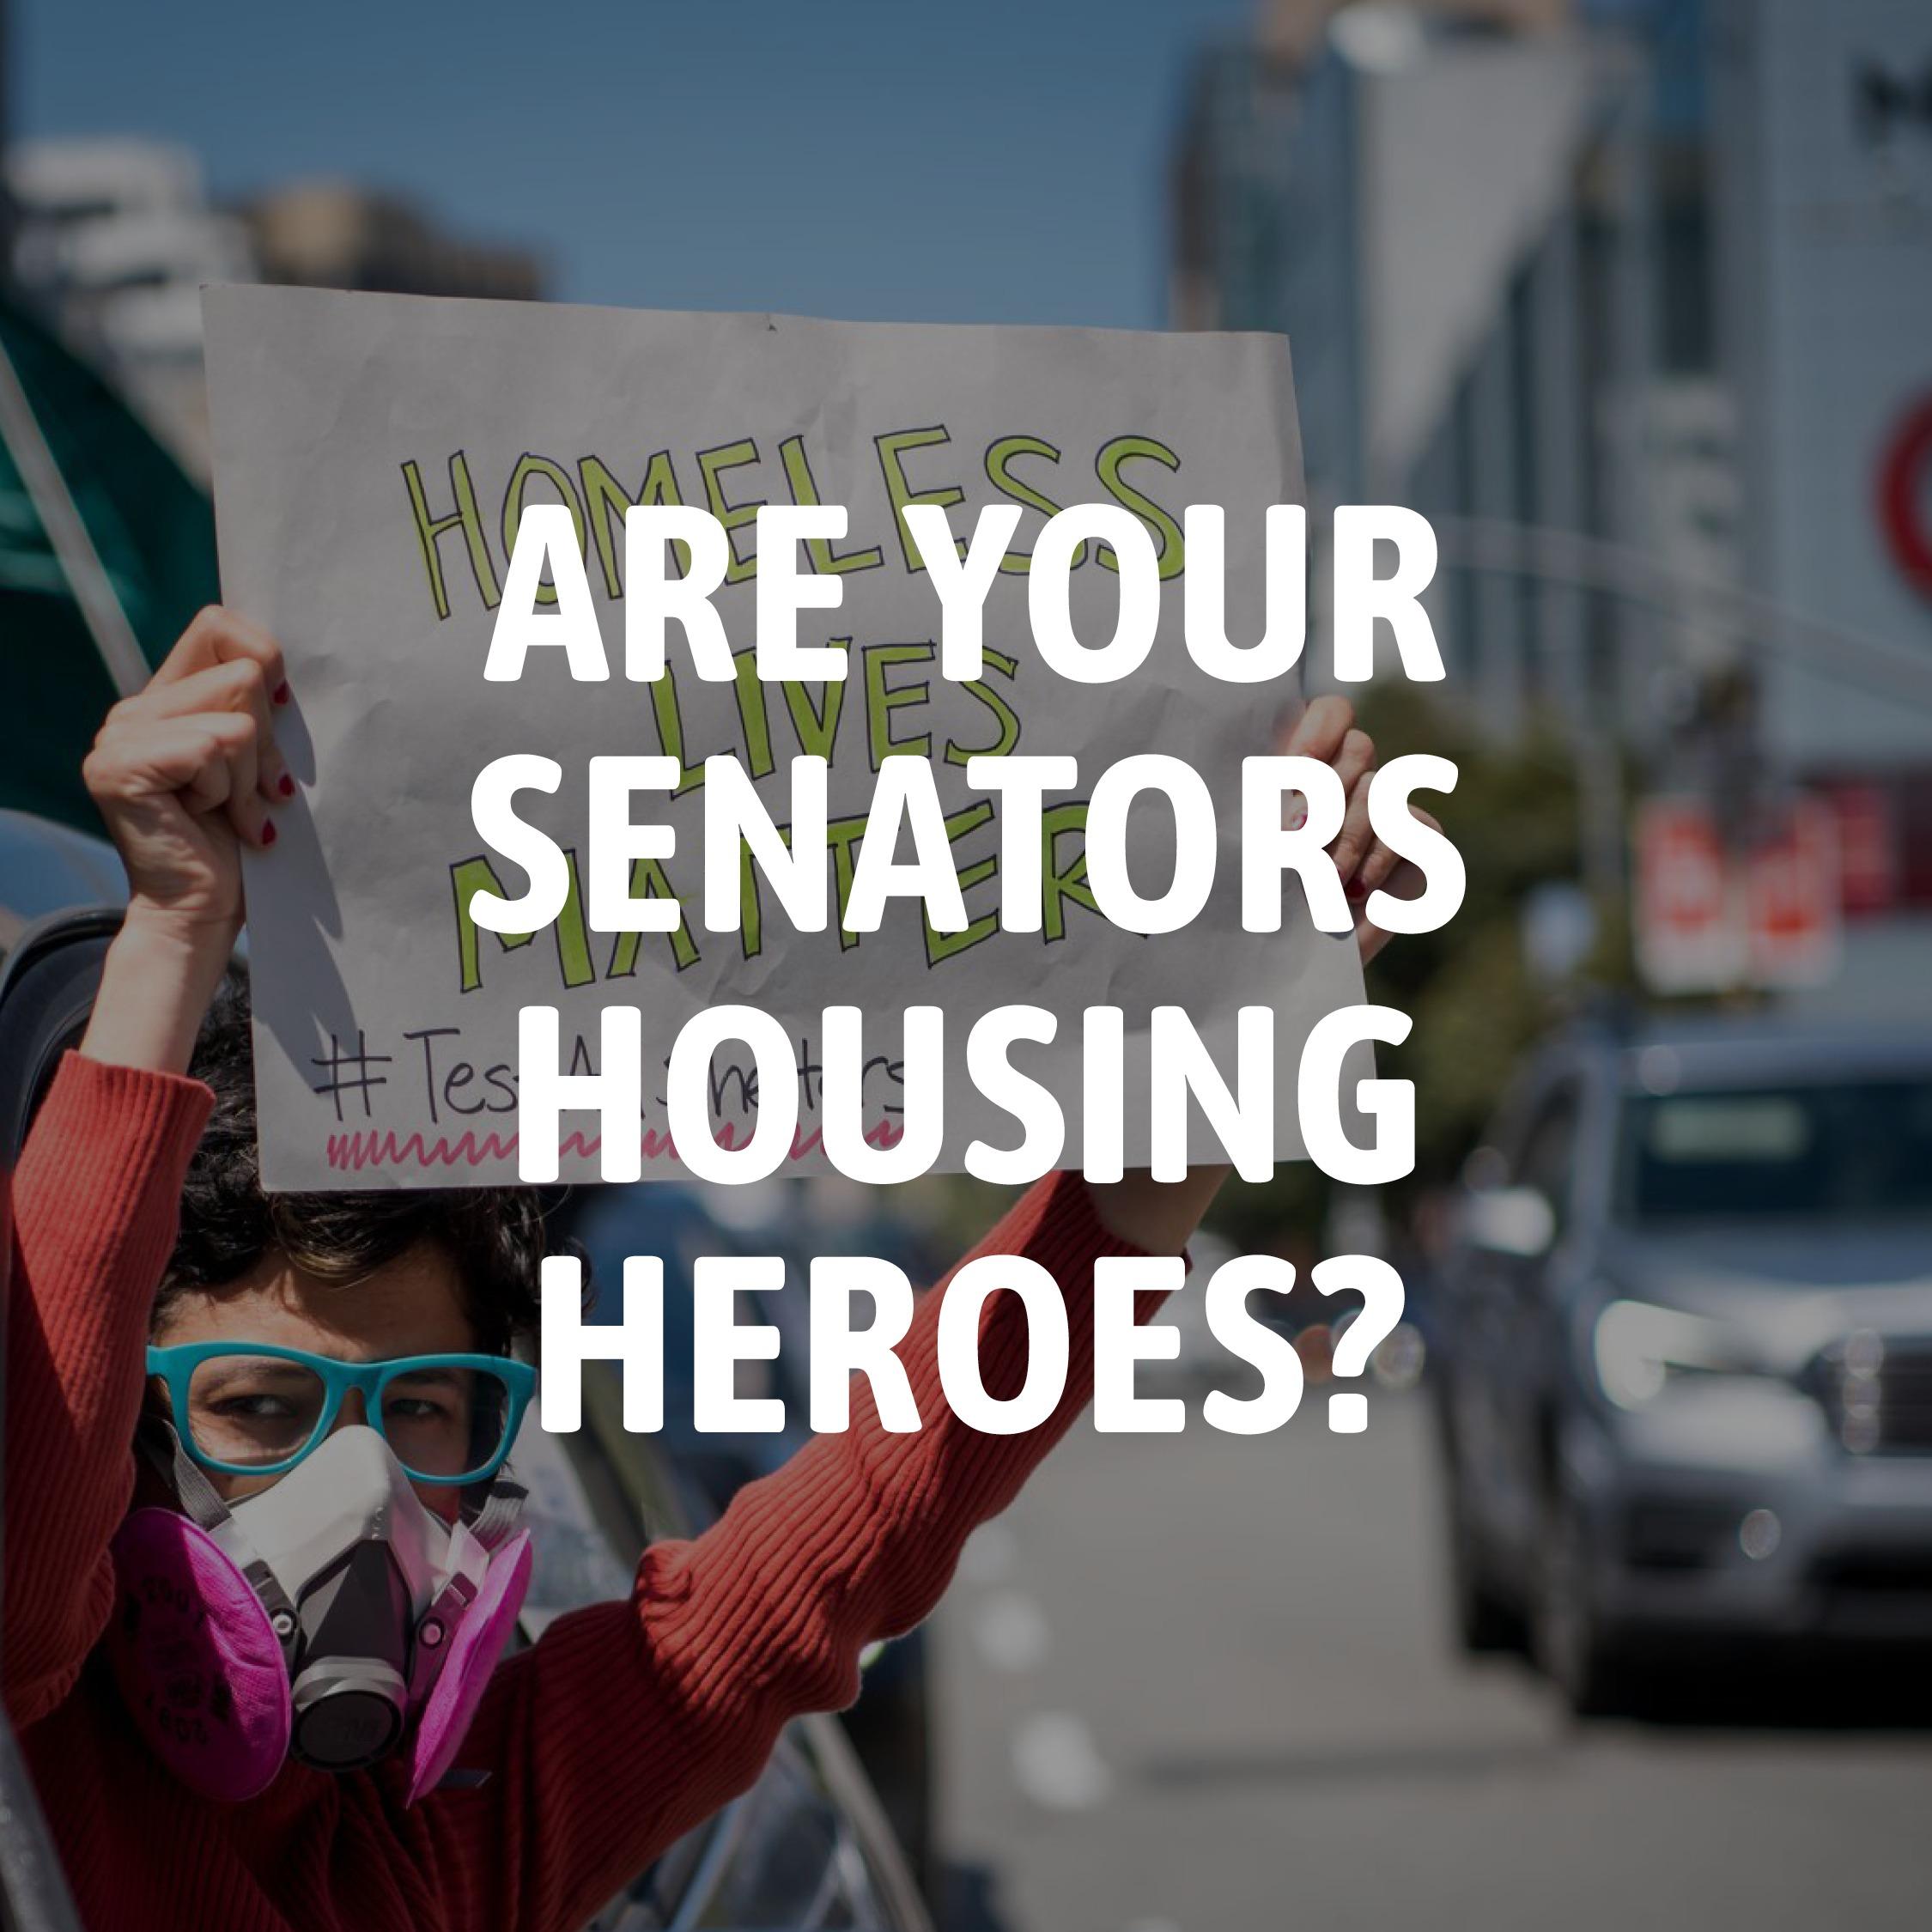 Are your senators housing heroes?